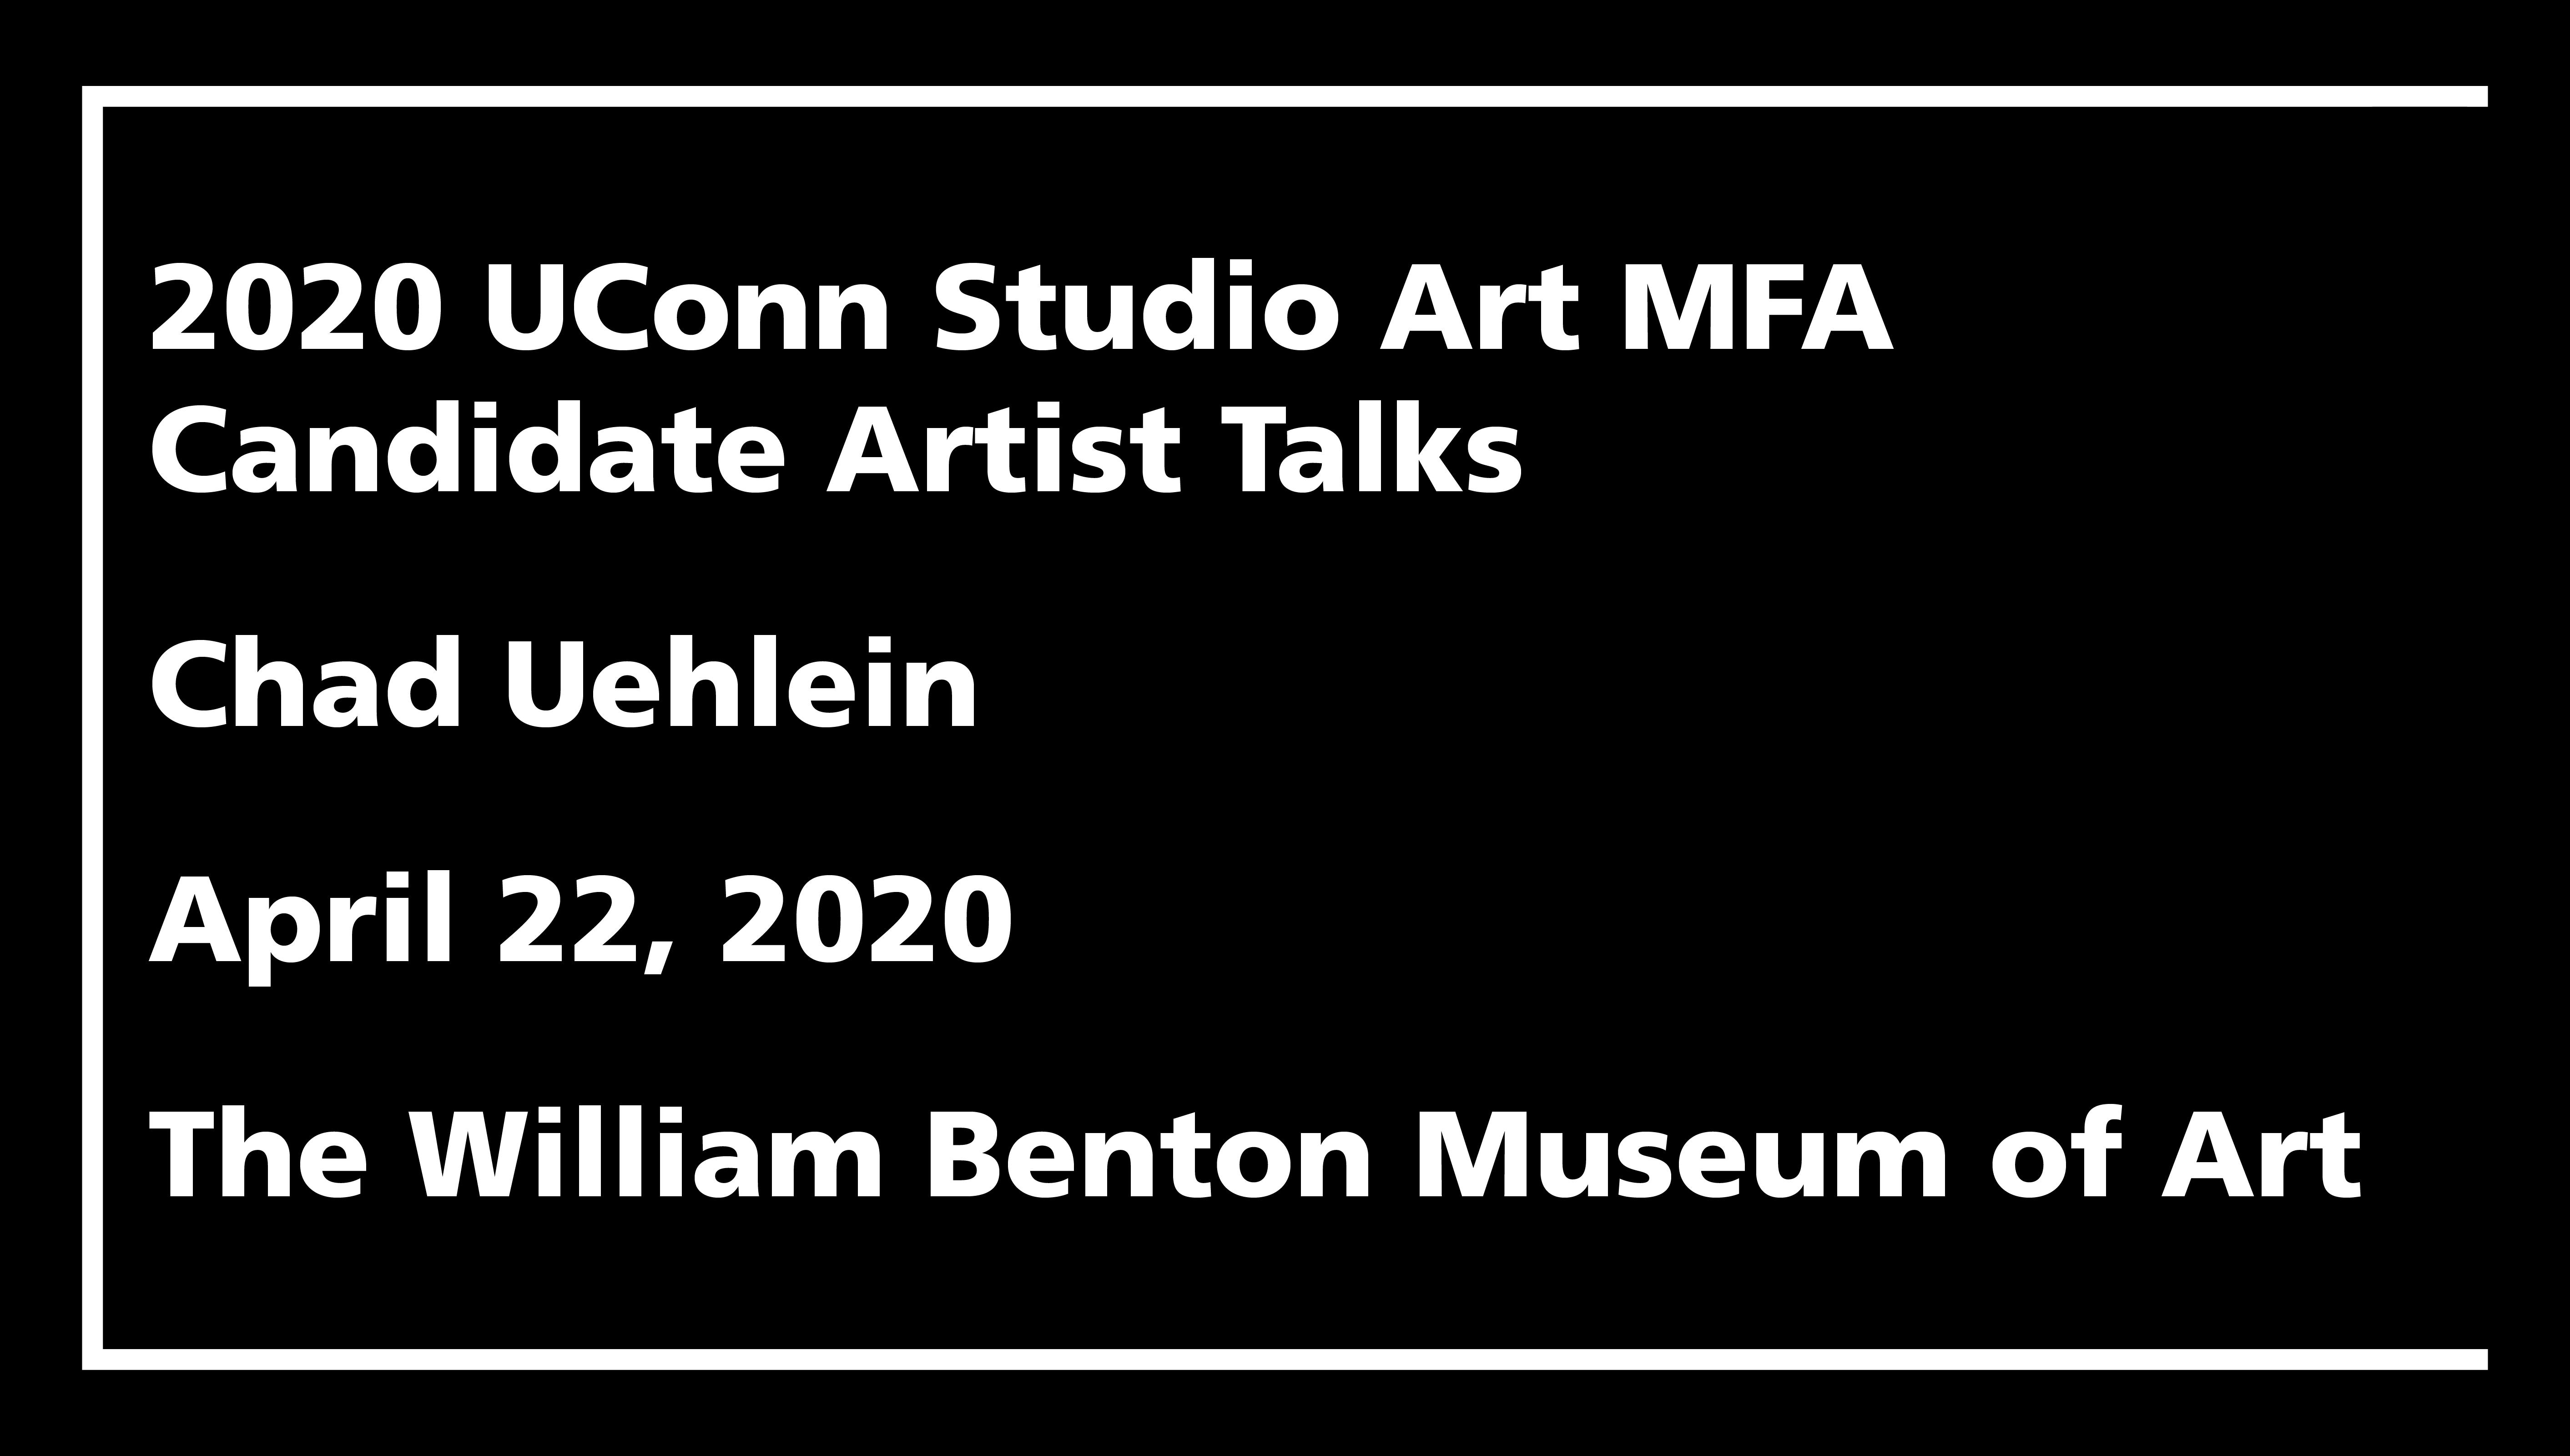 2020 UConn Studio Art MFA Candidate Artist Talks: Chad Uehlein